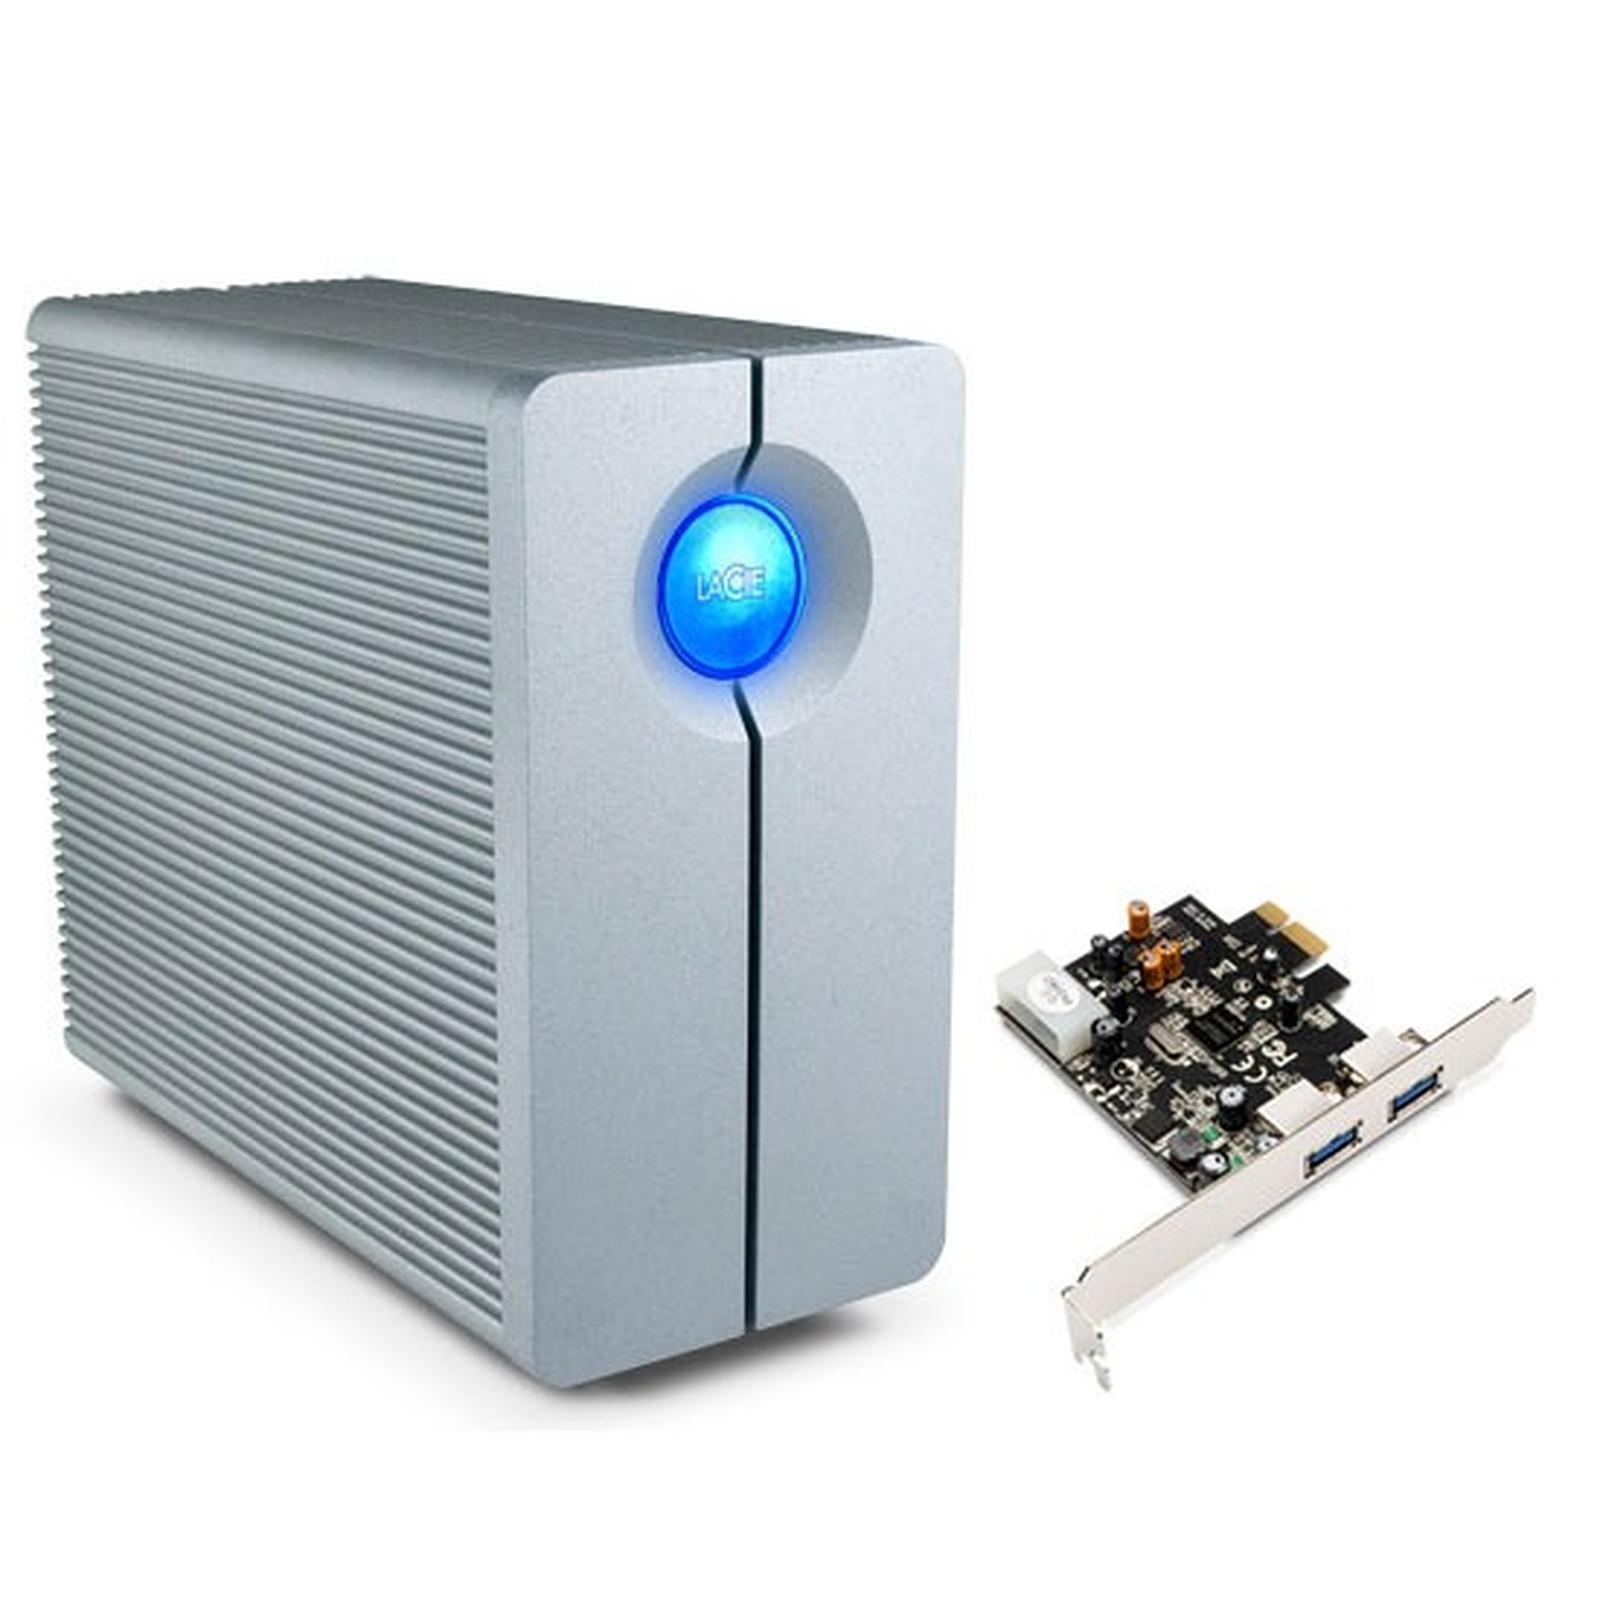 LaCie 2big 2 To (USB 3.0) + carte PCI-E (2x USB 3.0)